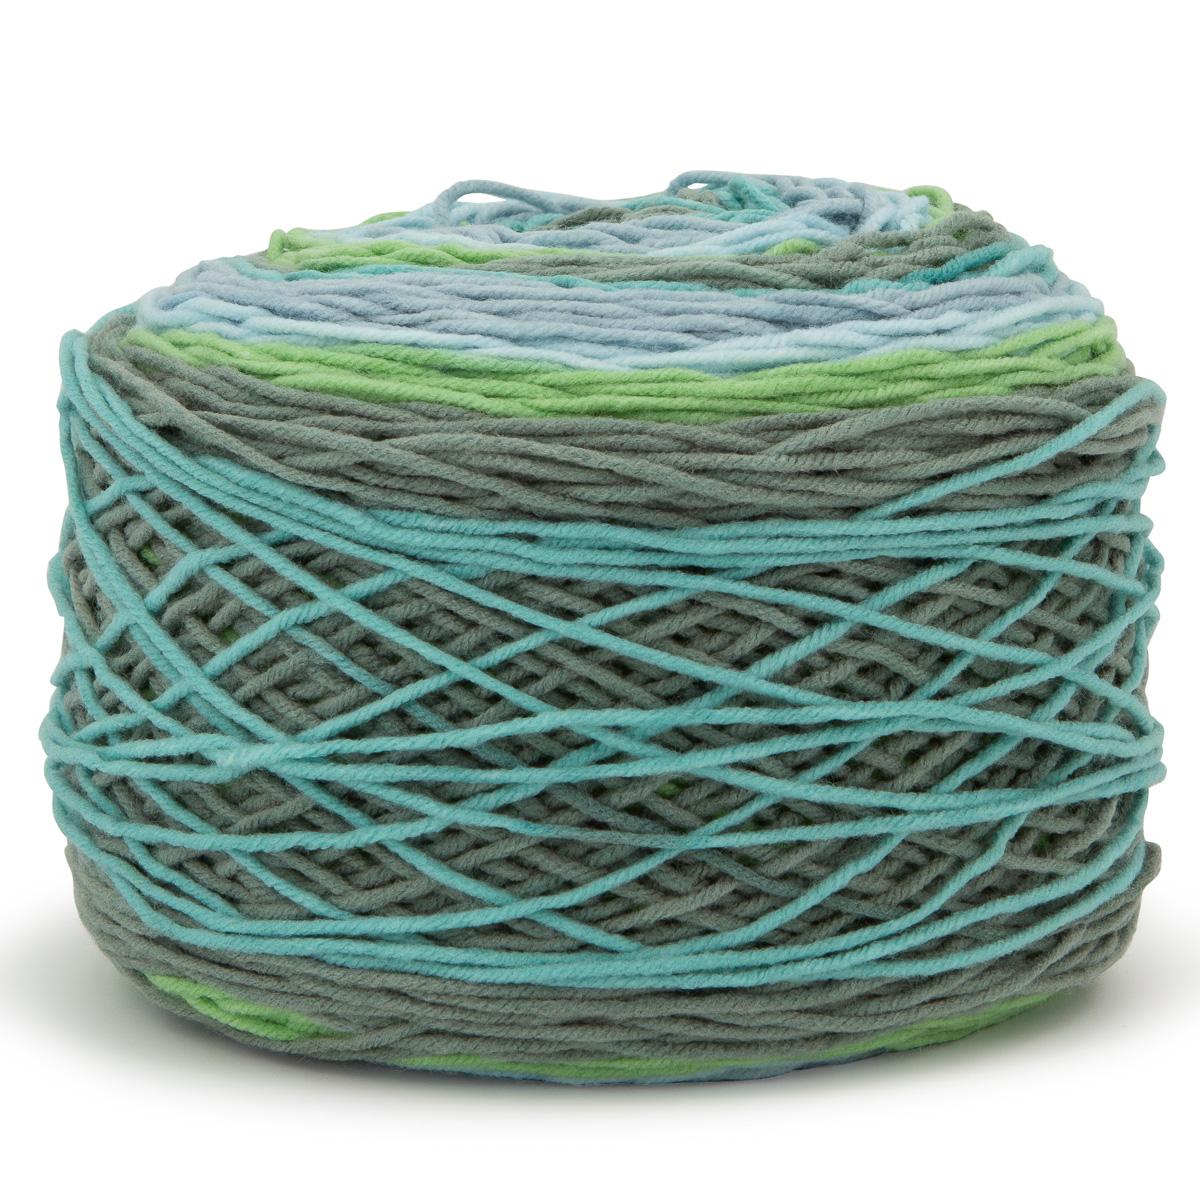 Caron-Big-Cakes-100-Acrylic-Worsted-Striping-Yarn-Medium-4-Cake-Knit-Crochet thumbnail 5